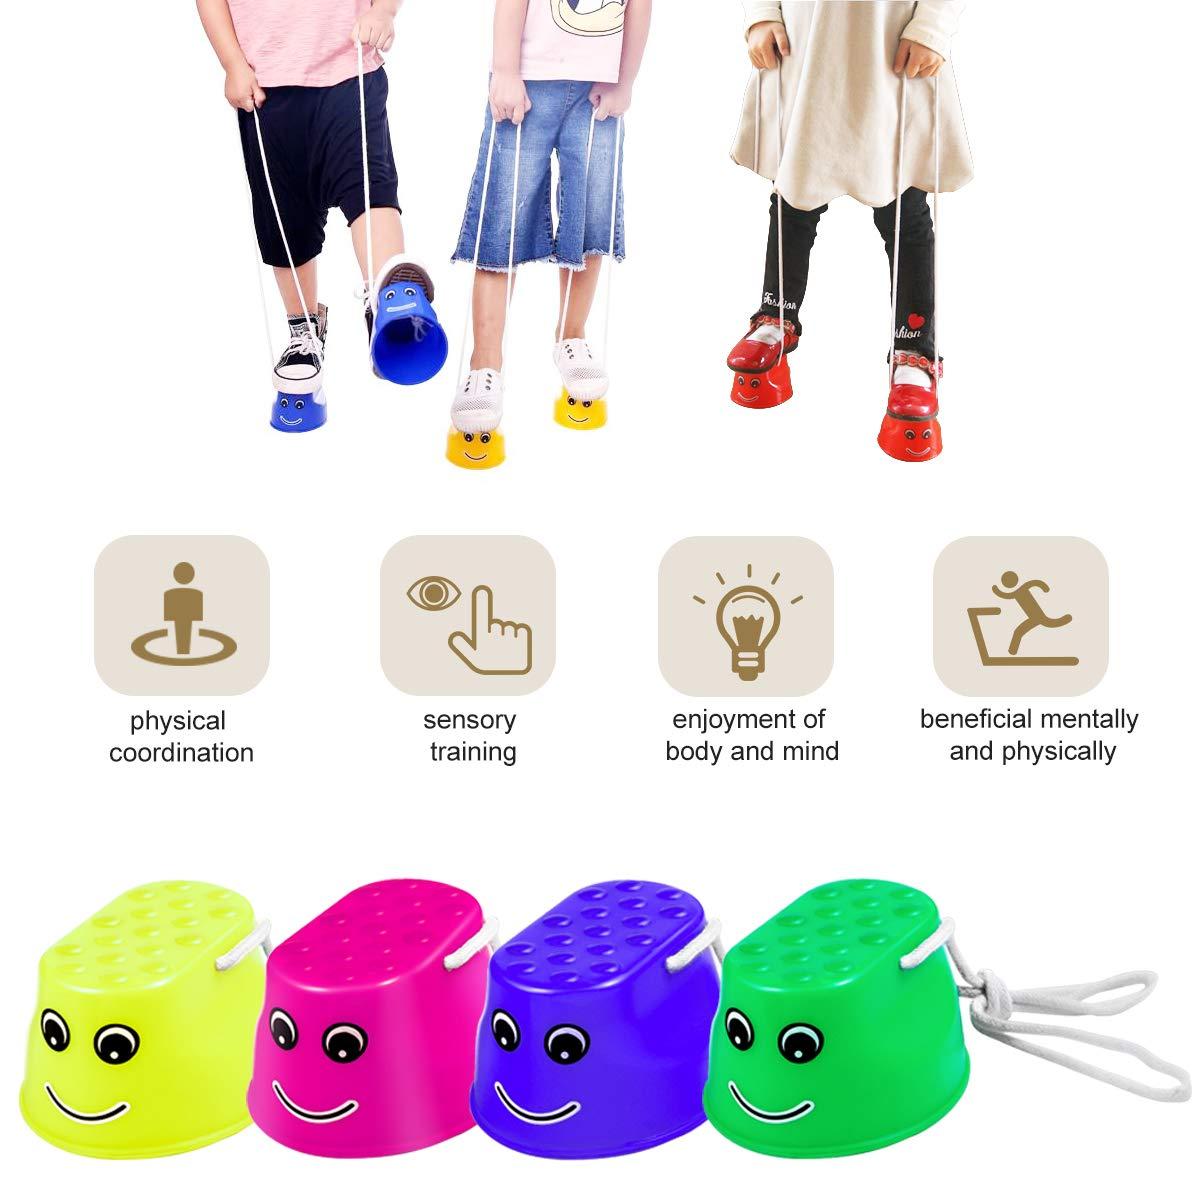 Toyvian Plataforma para Caminar Zancos para ni/ños Bucket Stilts Antideslizante sin Marcas Easy Stepper 4pcs